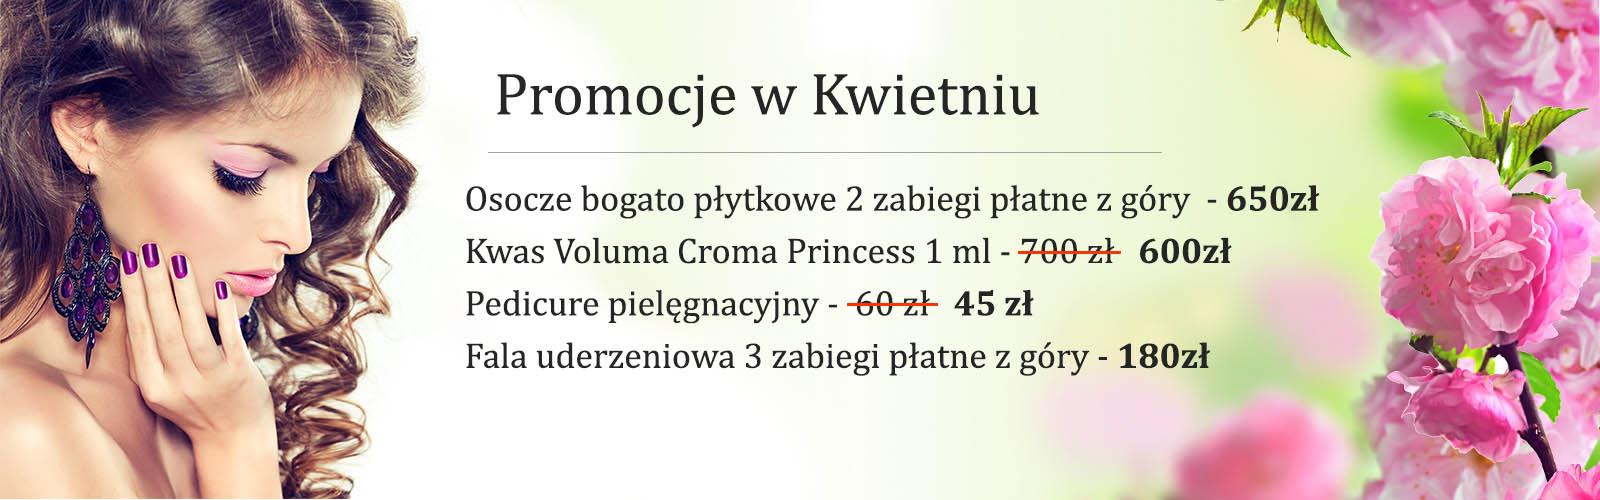 prom-kwiecien